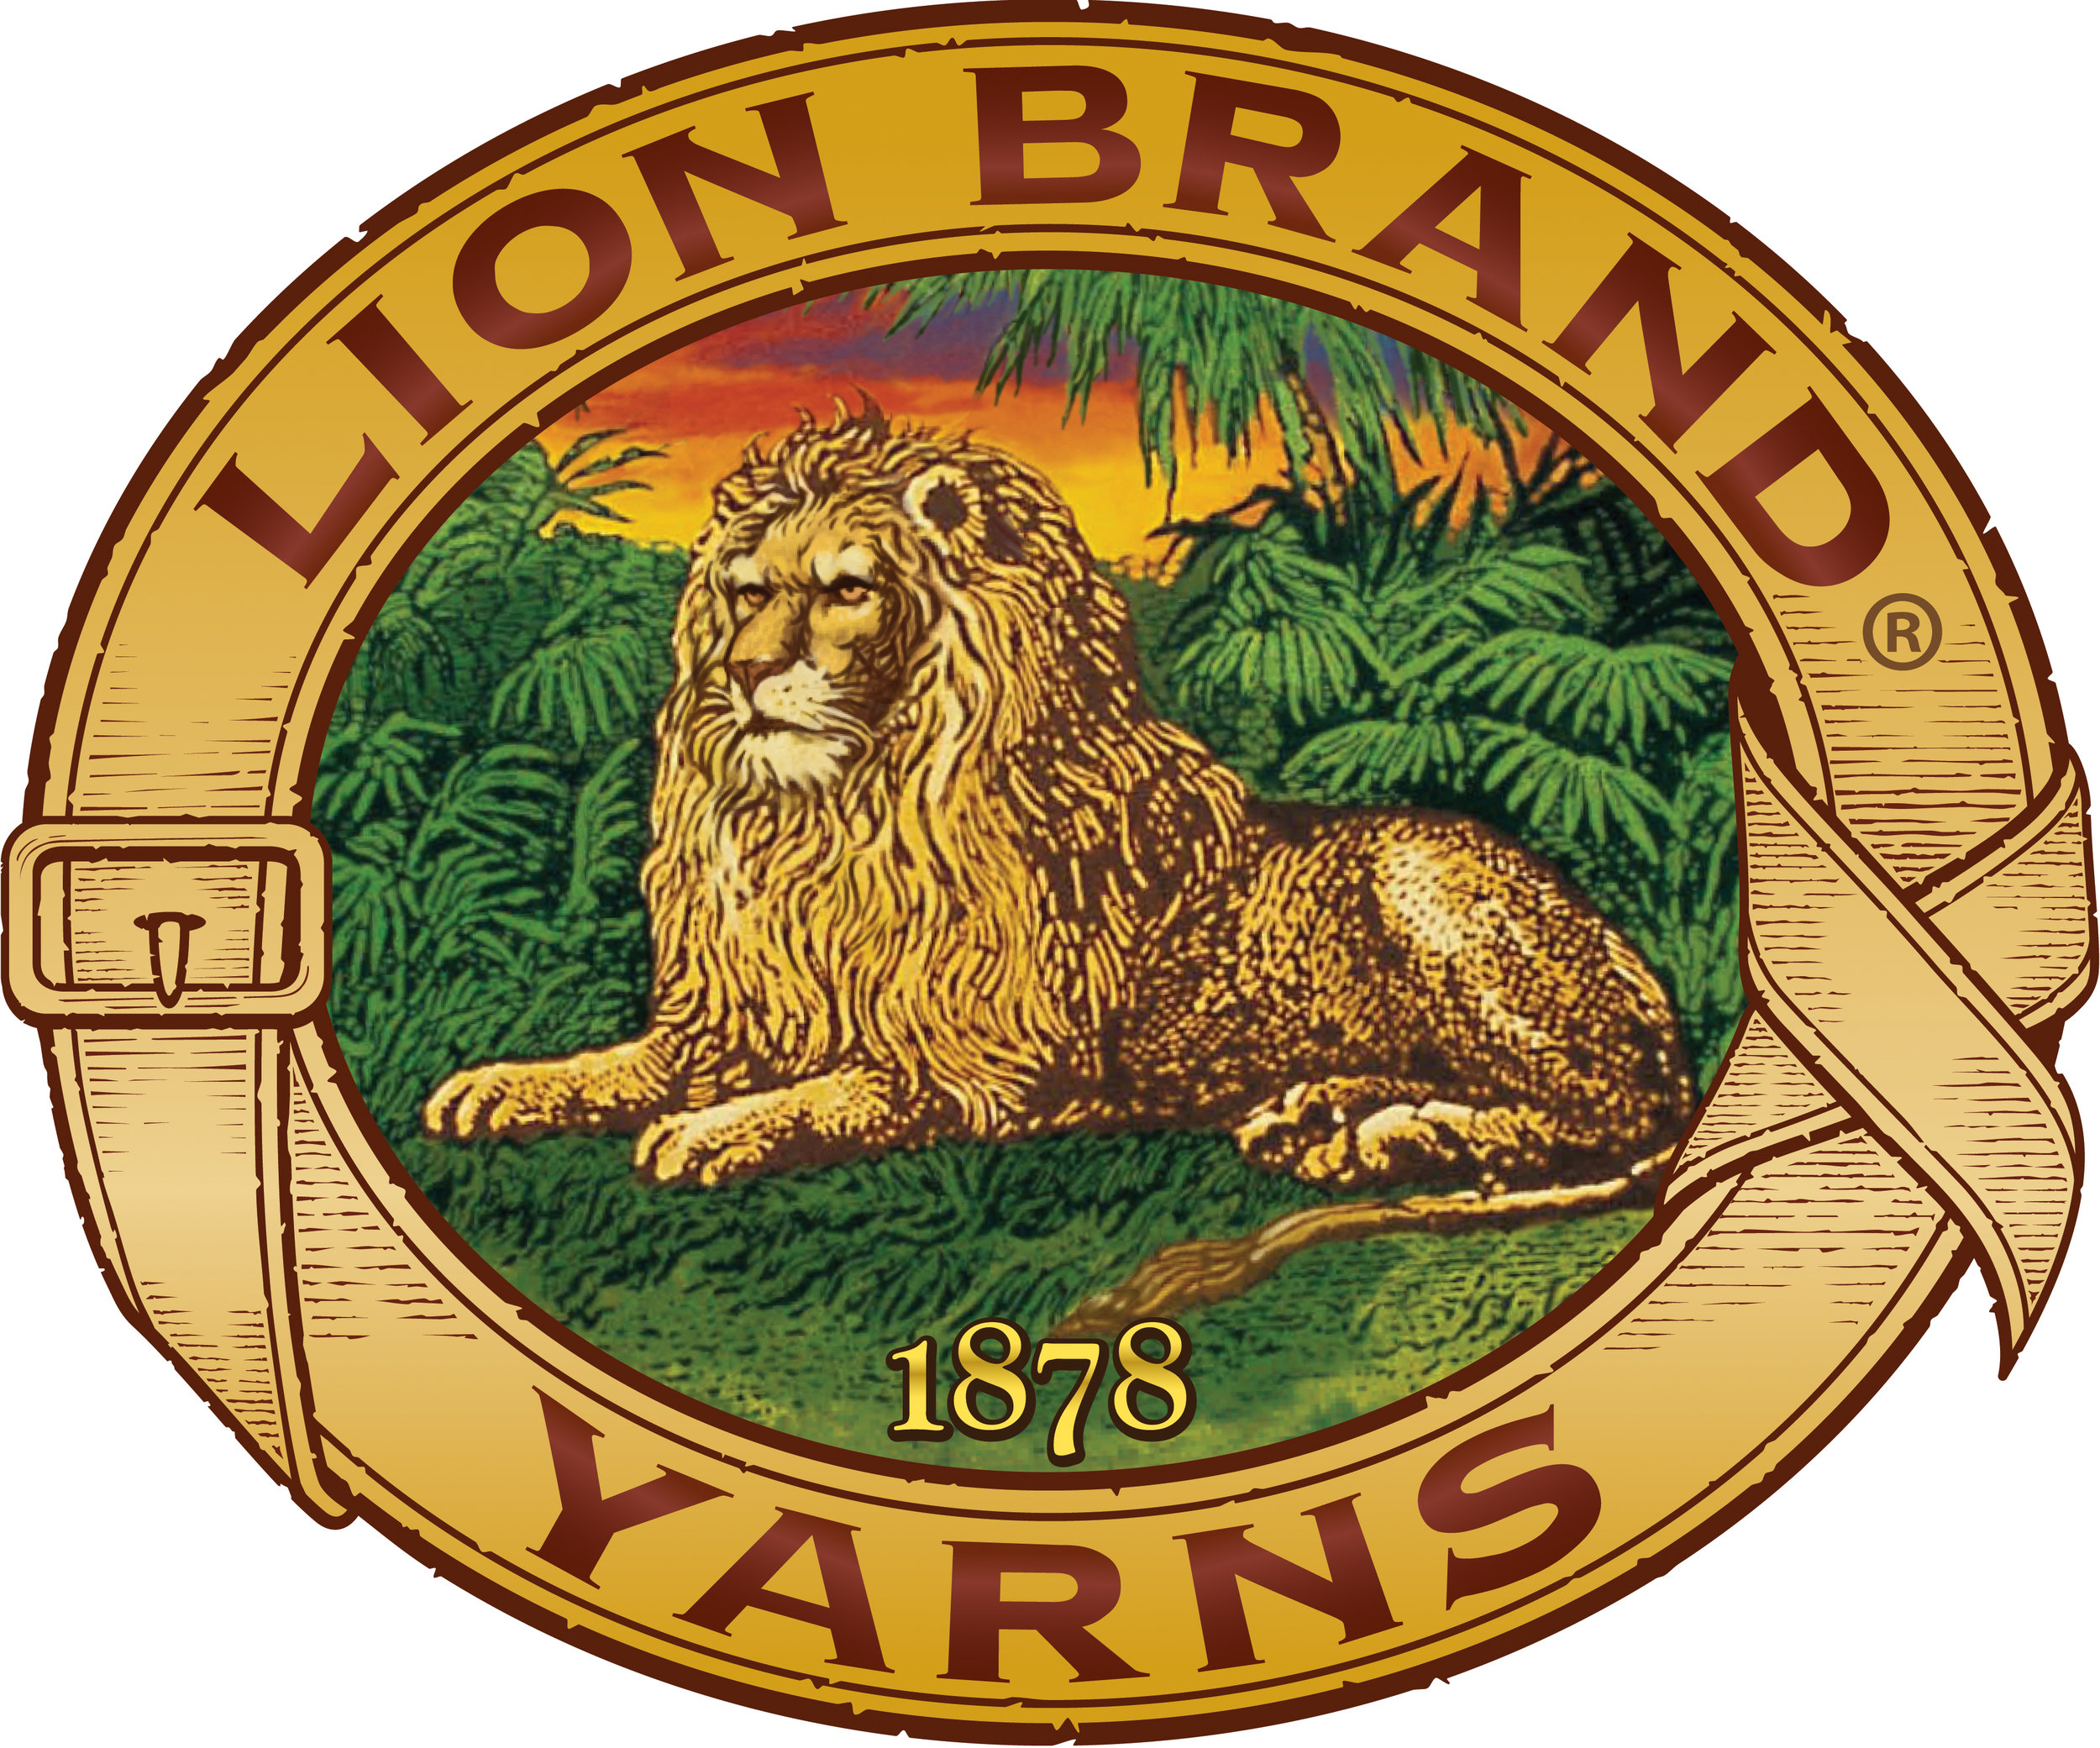 lion_brand_logo_color.jpg